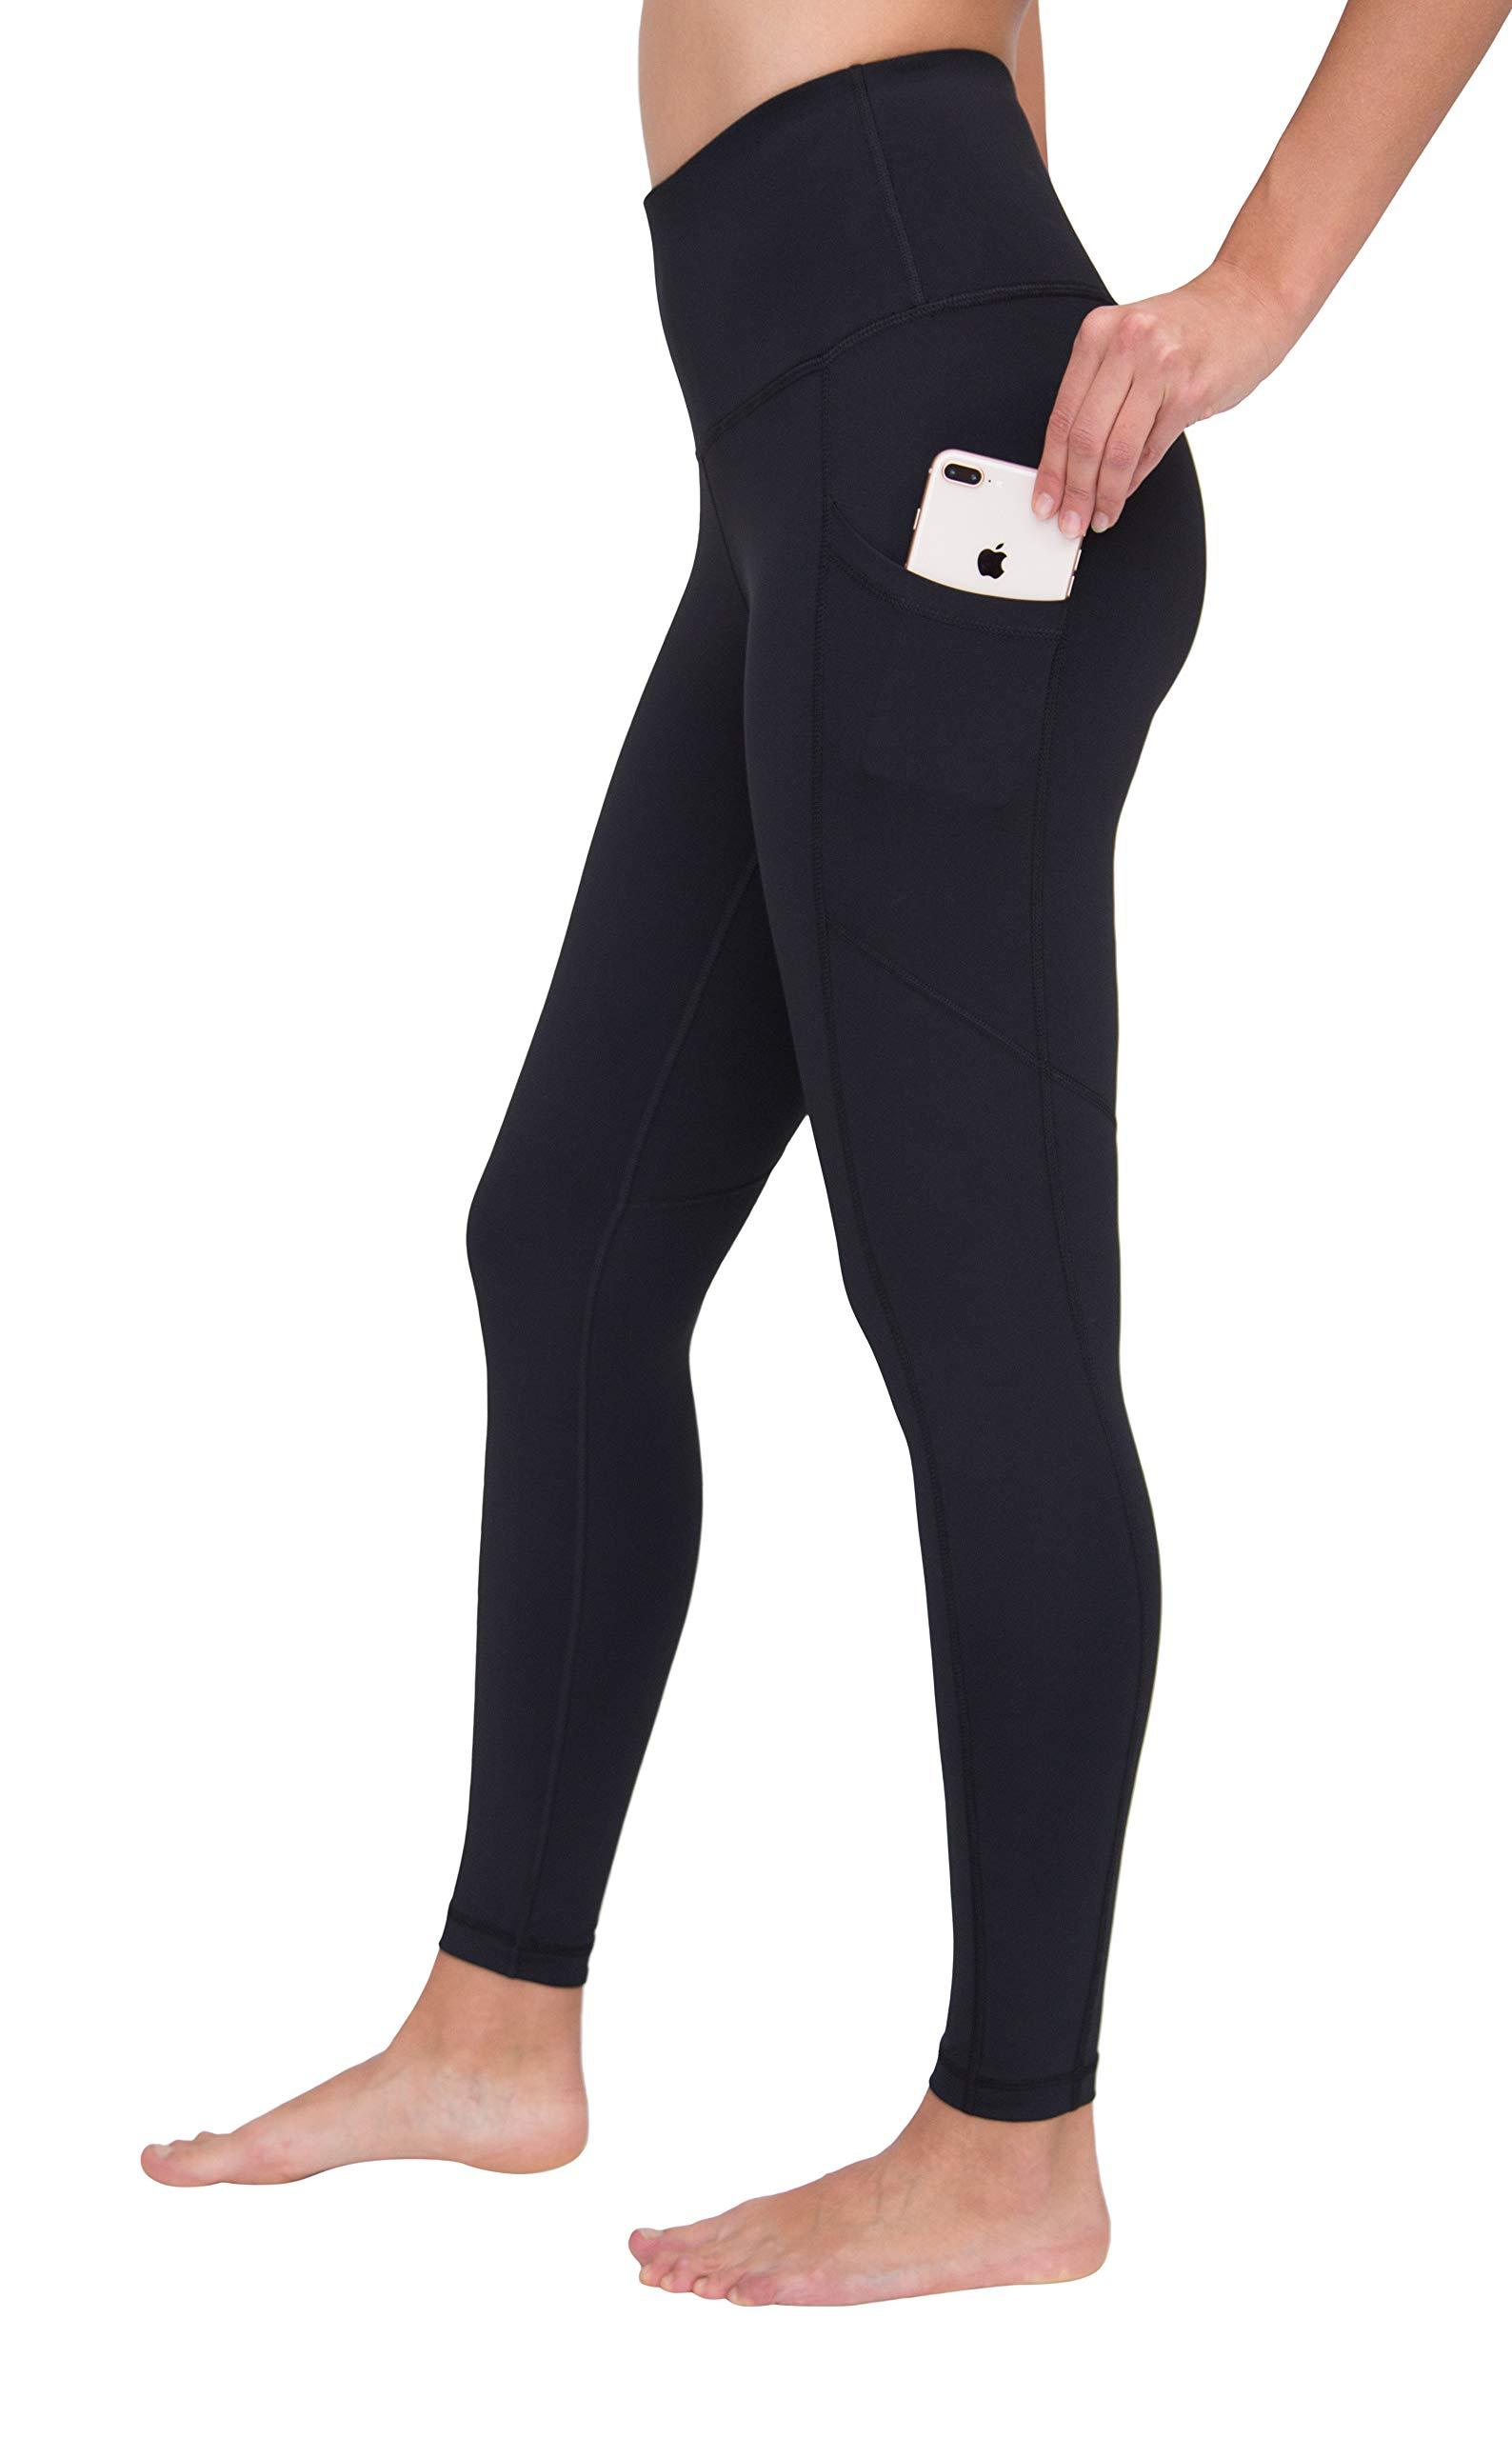 90 Degree By Reflex Women's Power Flex Yoga Pants - Black 2019 - Medium by 90 Degree By Reflex